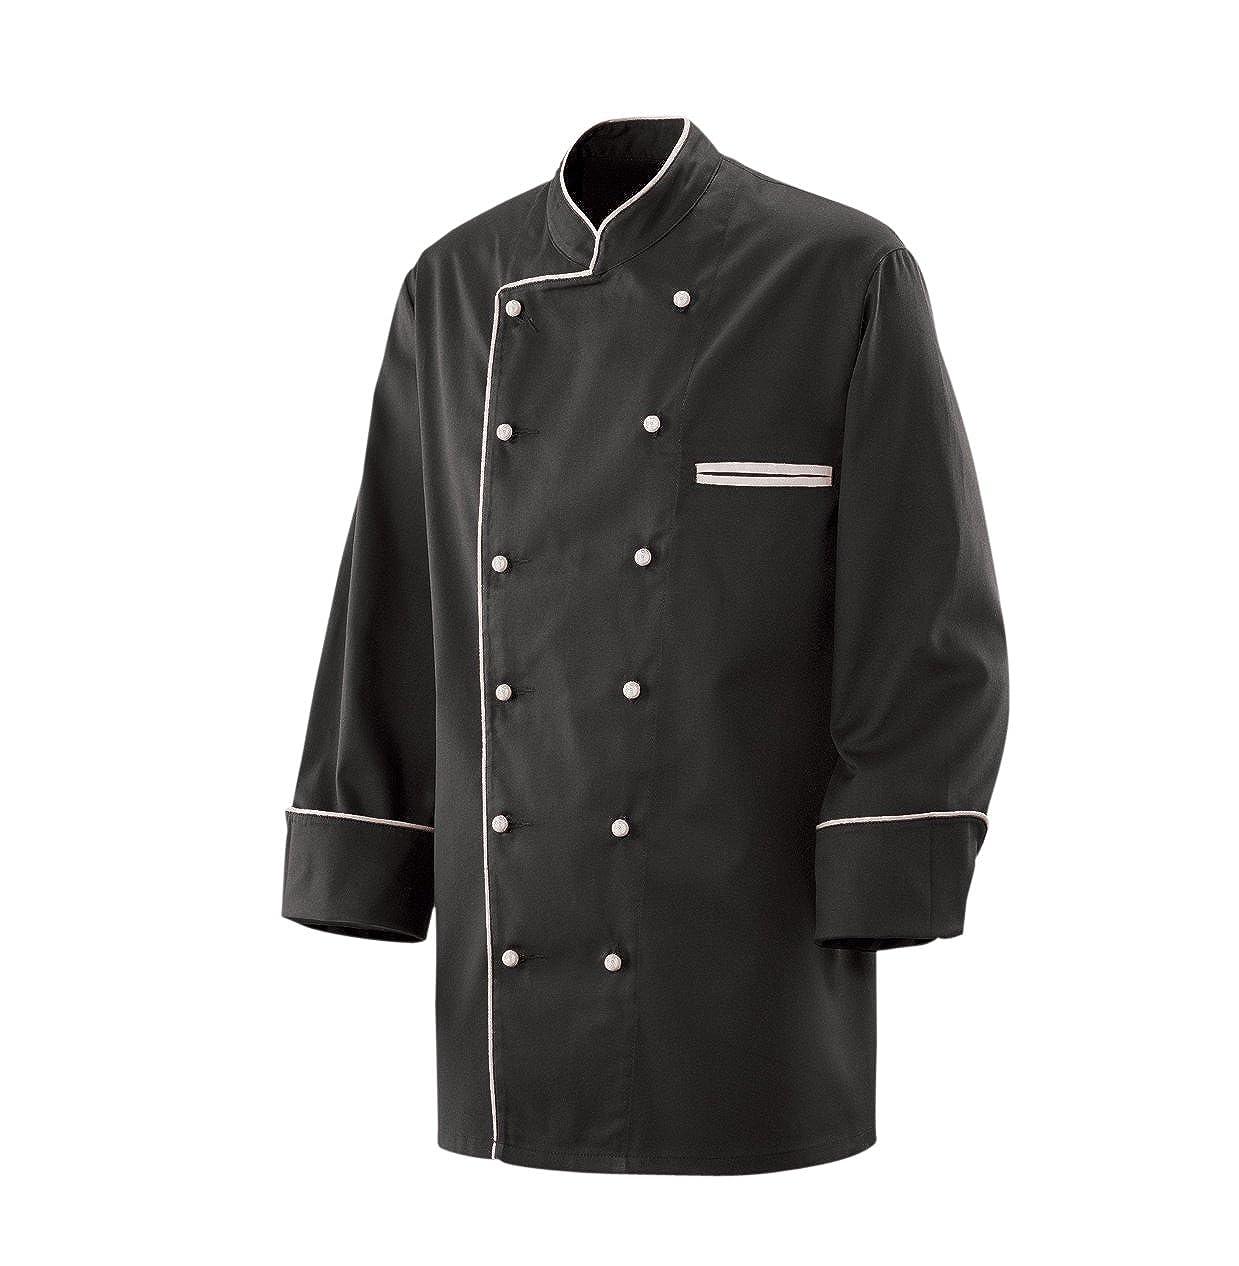 Kochjacke Bäckerjacke Jacke Langarm Schwarz mit weißem Paspel aus 35% Baumwolle, 65% Polyester 220gr.